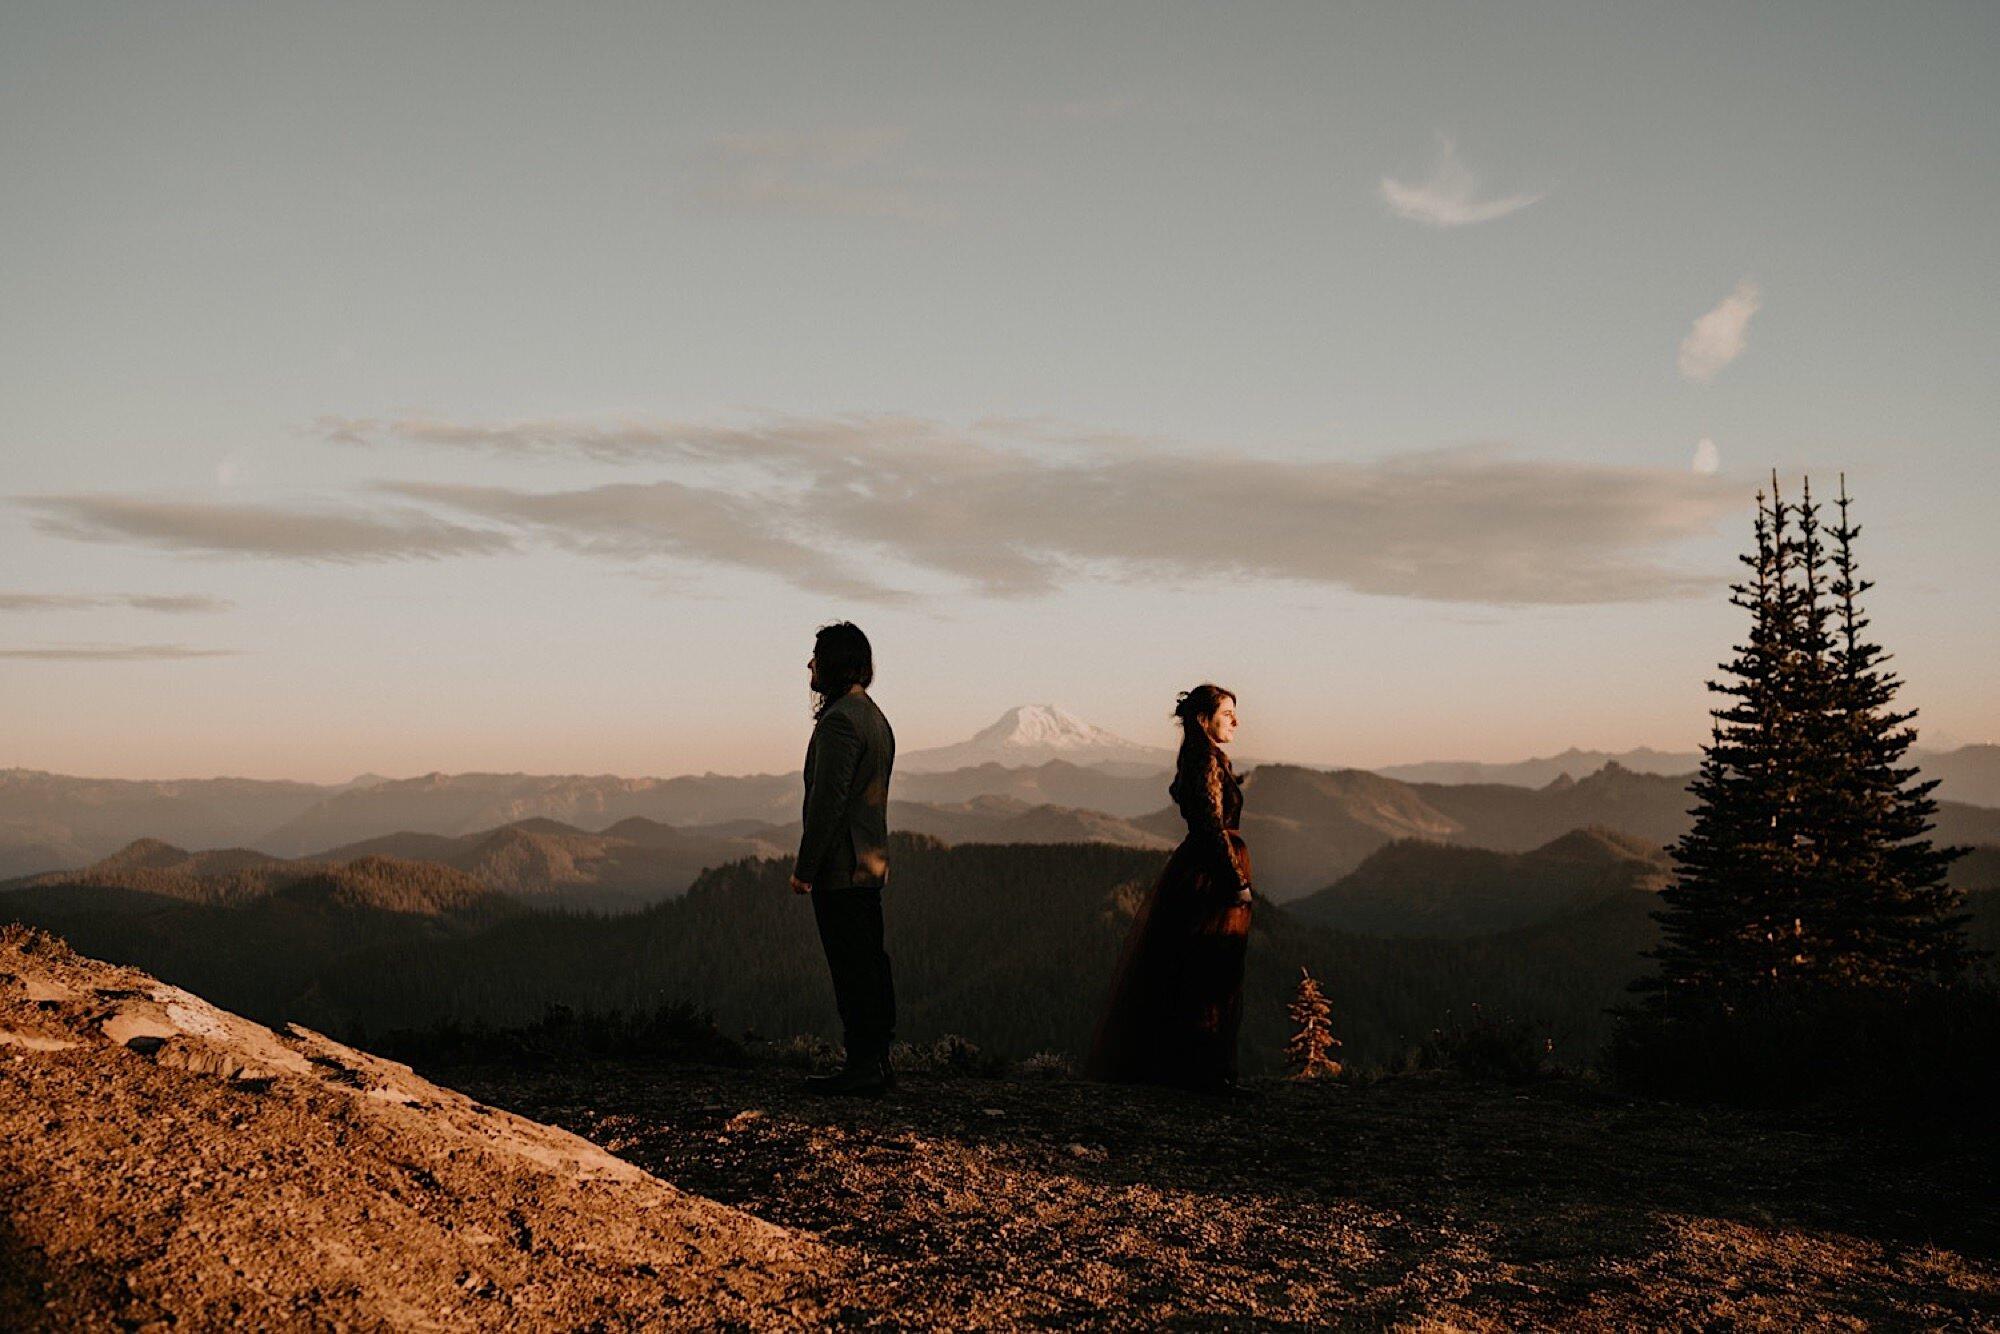 mount-rainier-hiking-adventure-elopement-08.jpg